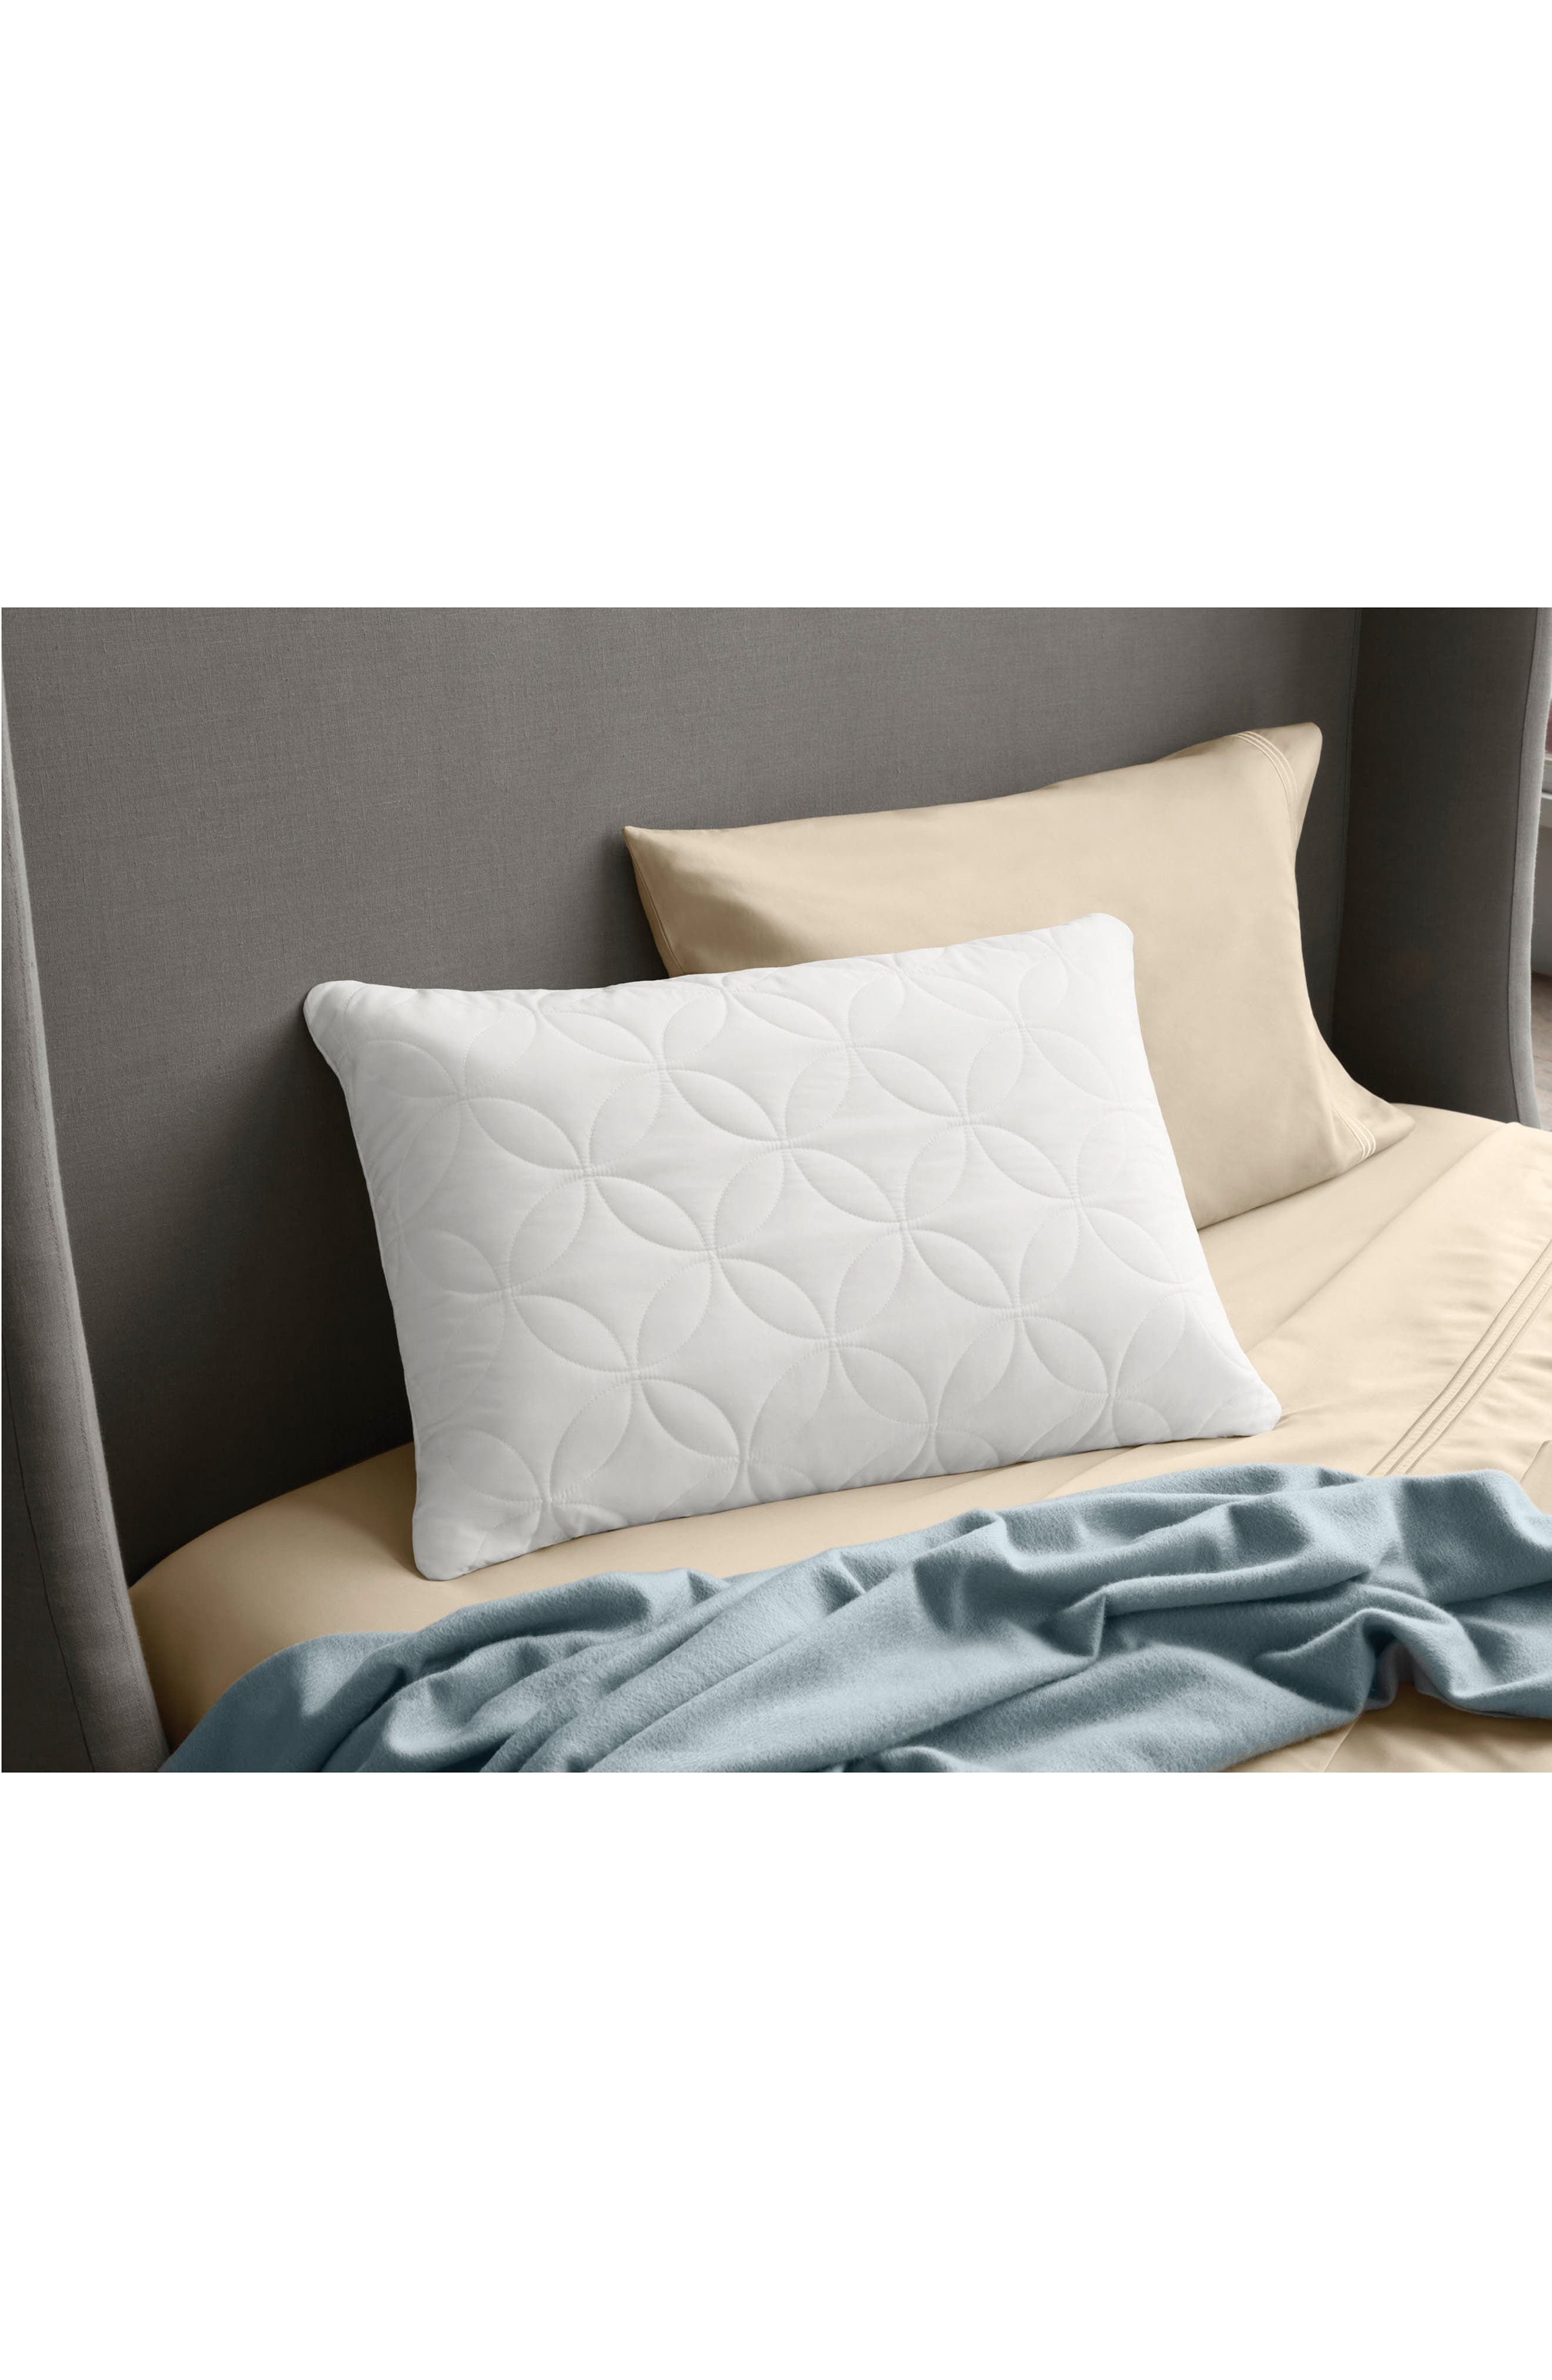 Alternate Image 3  - Tempur-Pedic TEMPUR-Cloud Soft & Conforming Queen Pillow